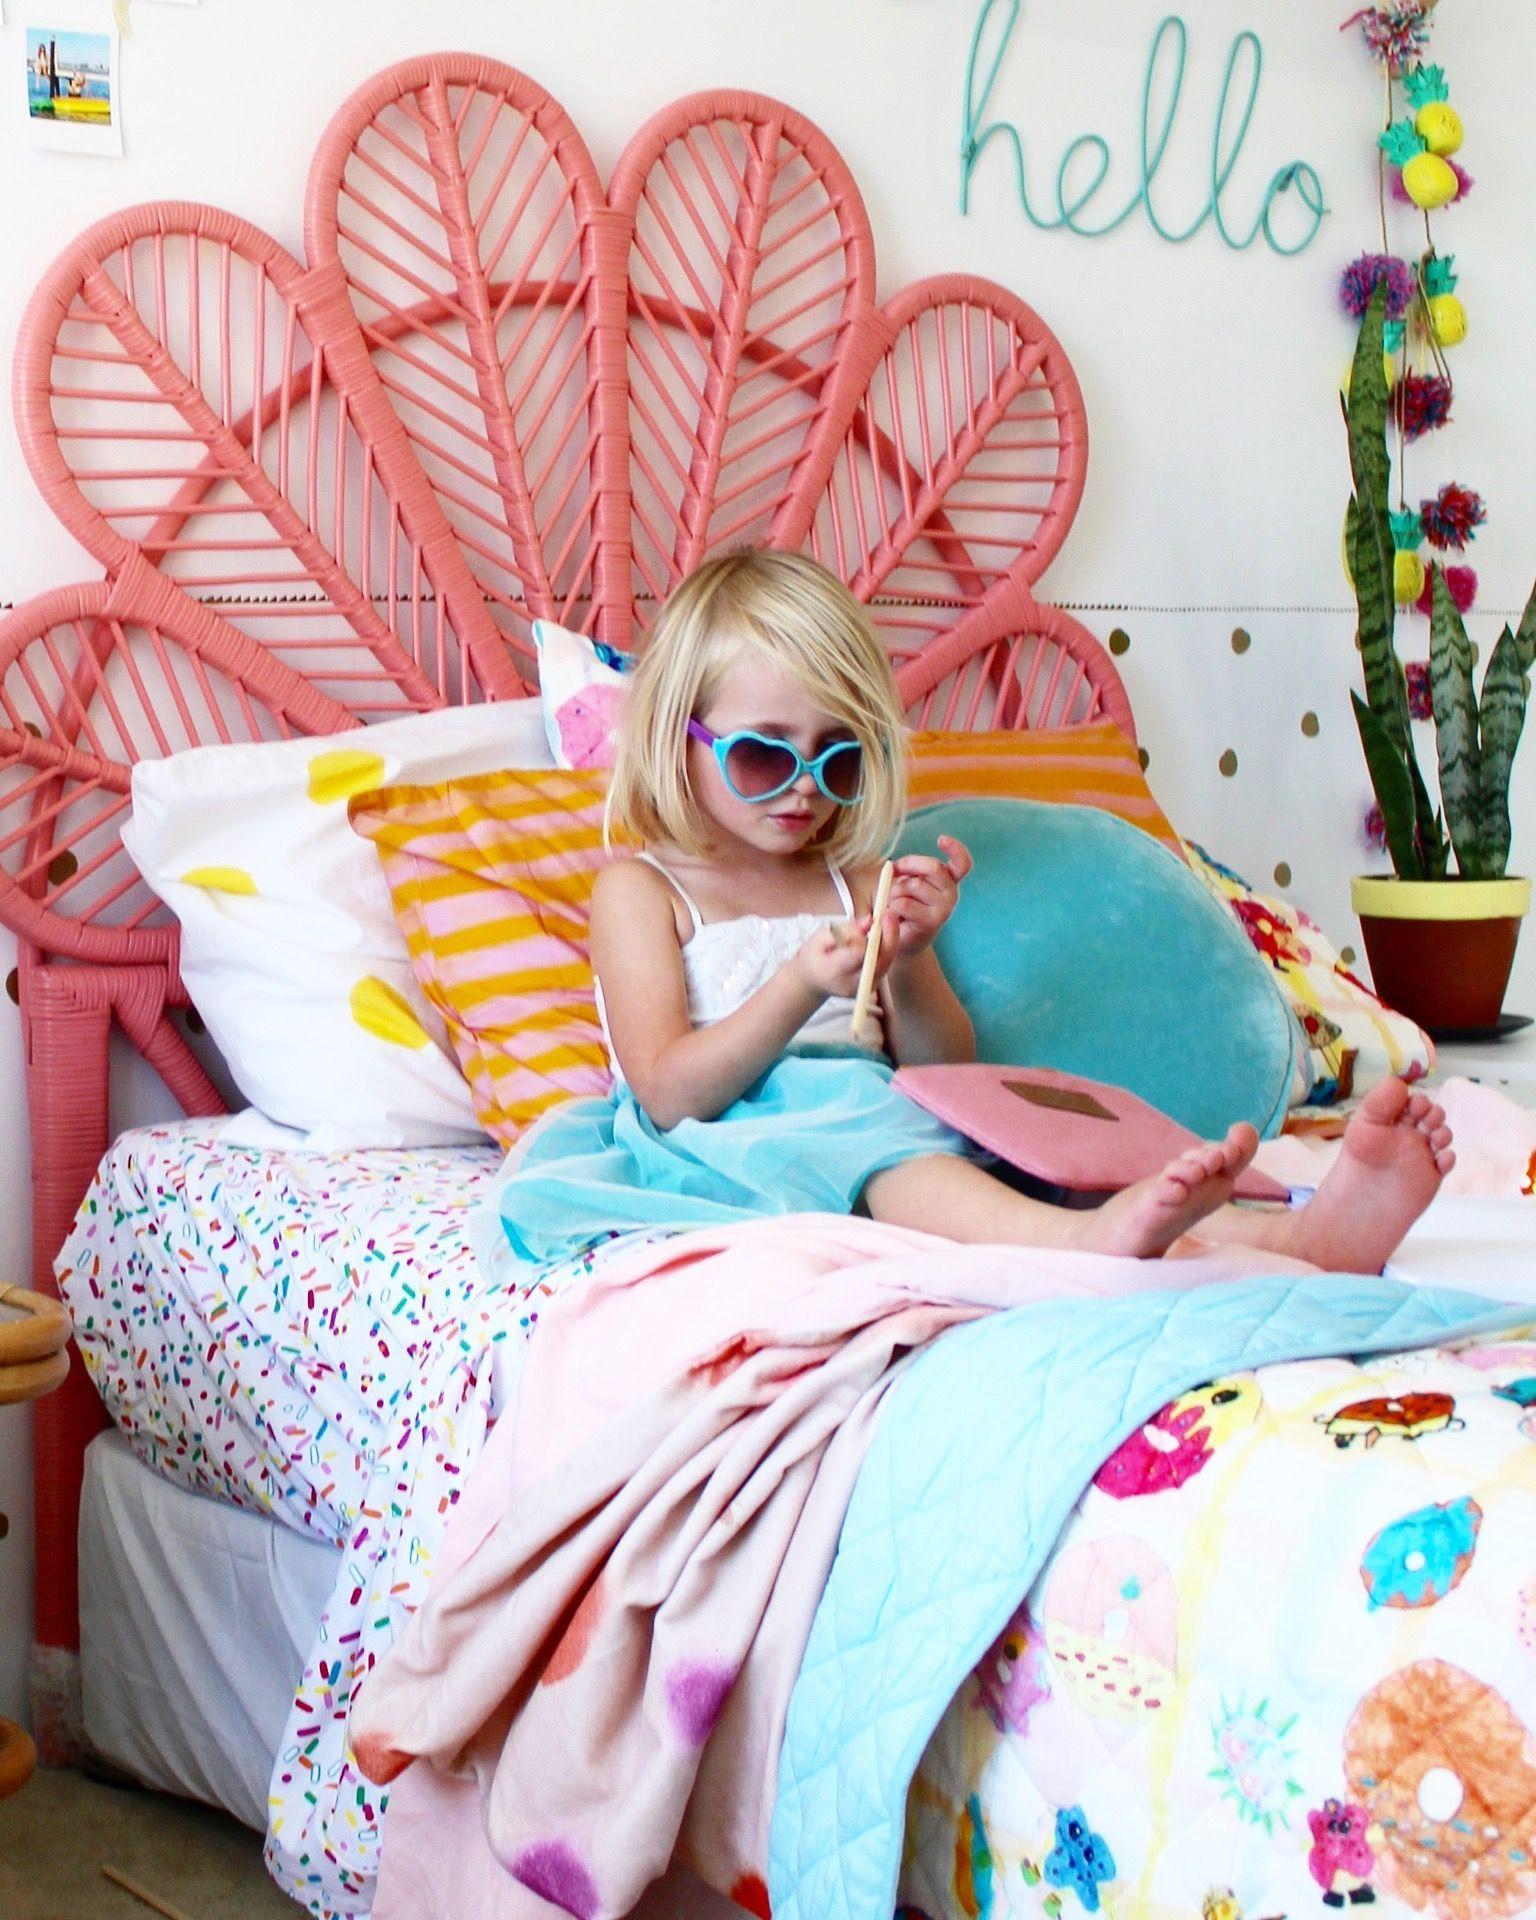 Modern Boho Kids rooms Girls bedroom ideas kids bedding and decor